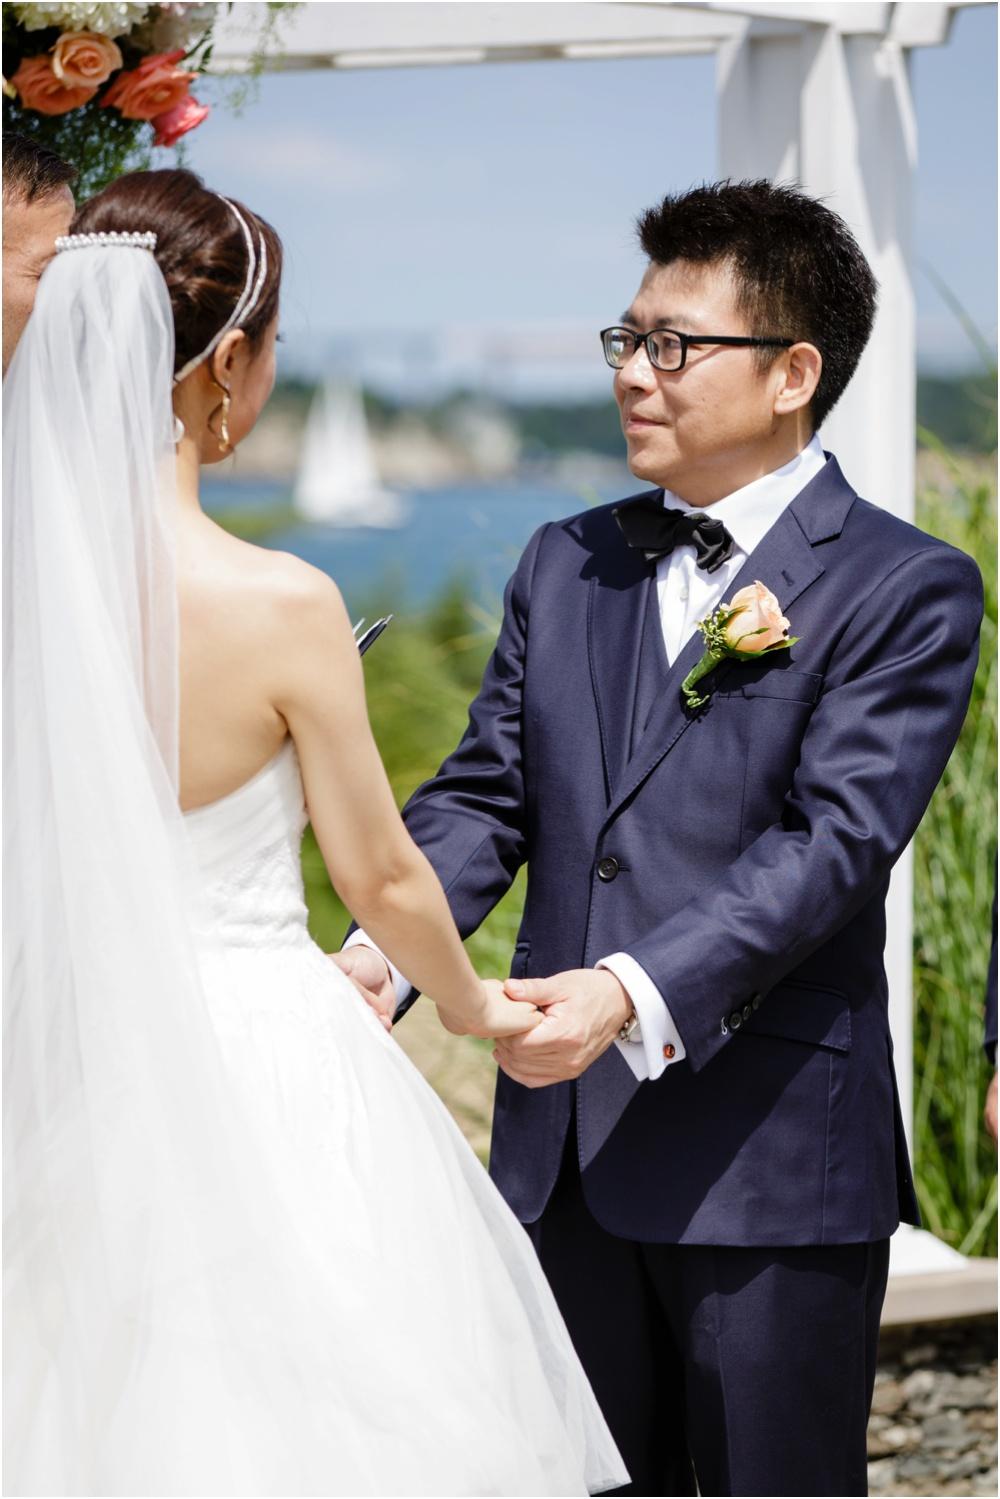 RI-Wedding-Photographer-Lefebvre-Photo-Blog_3207.jpg